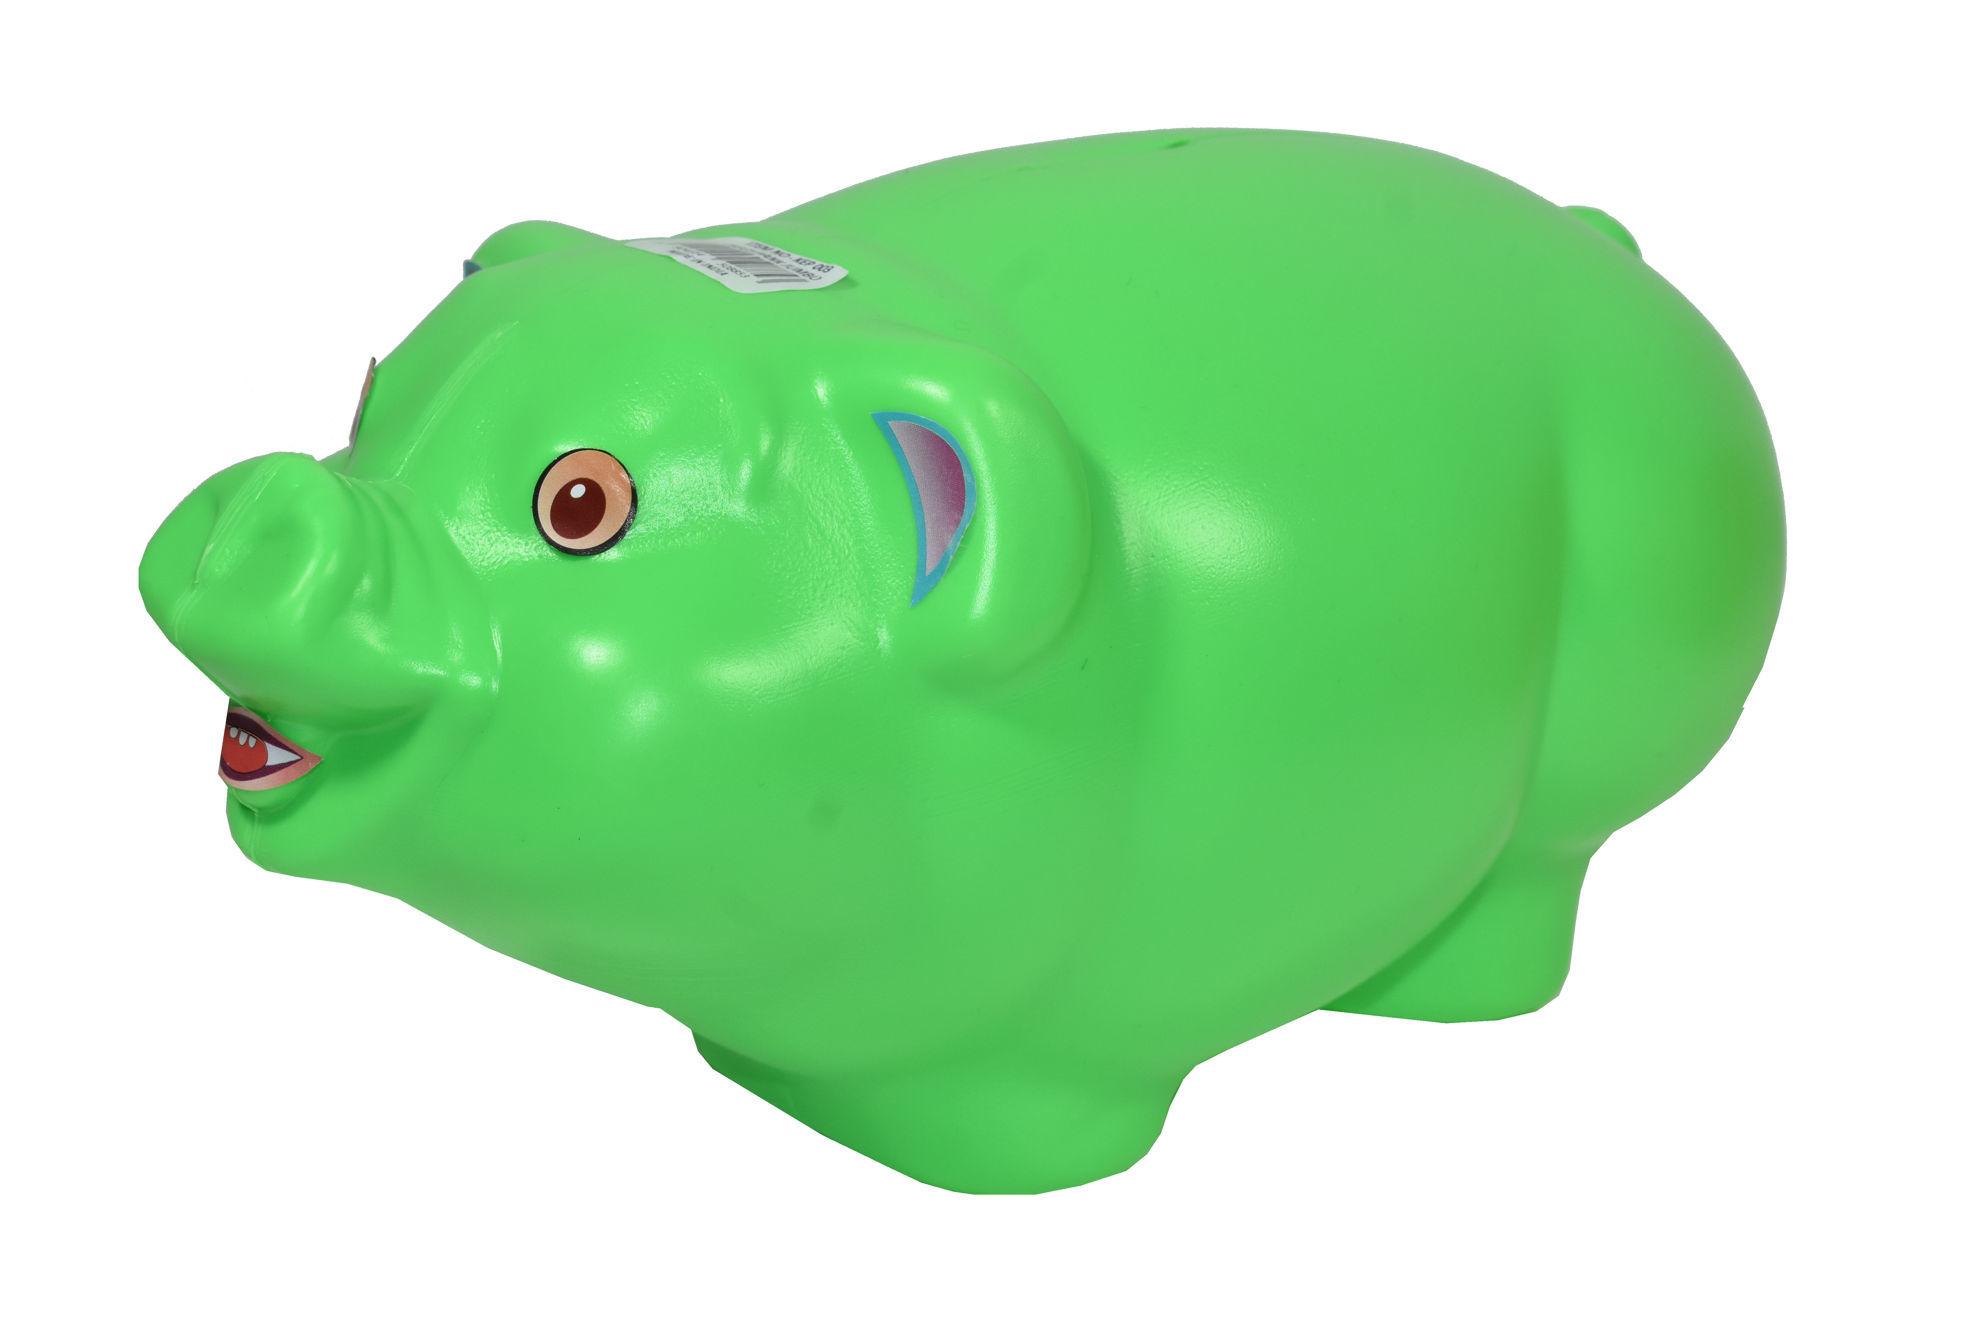 Foto de Alcancia chancho grande KEP003 15x30cms piggy bank jumbo